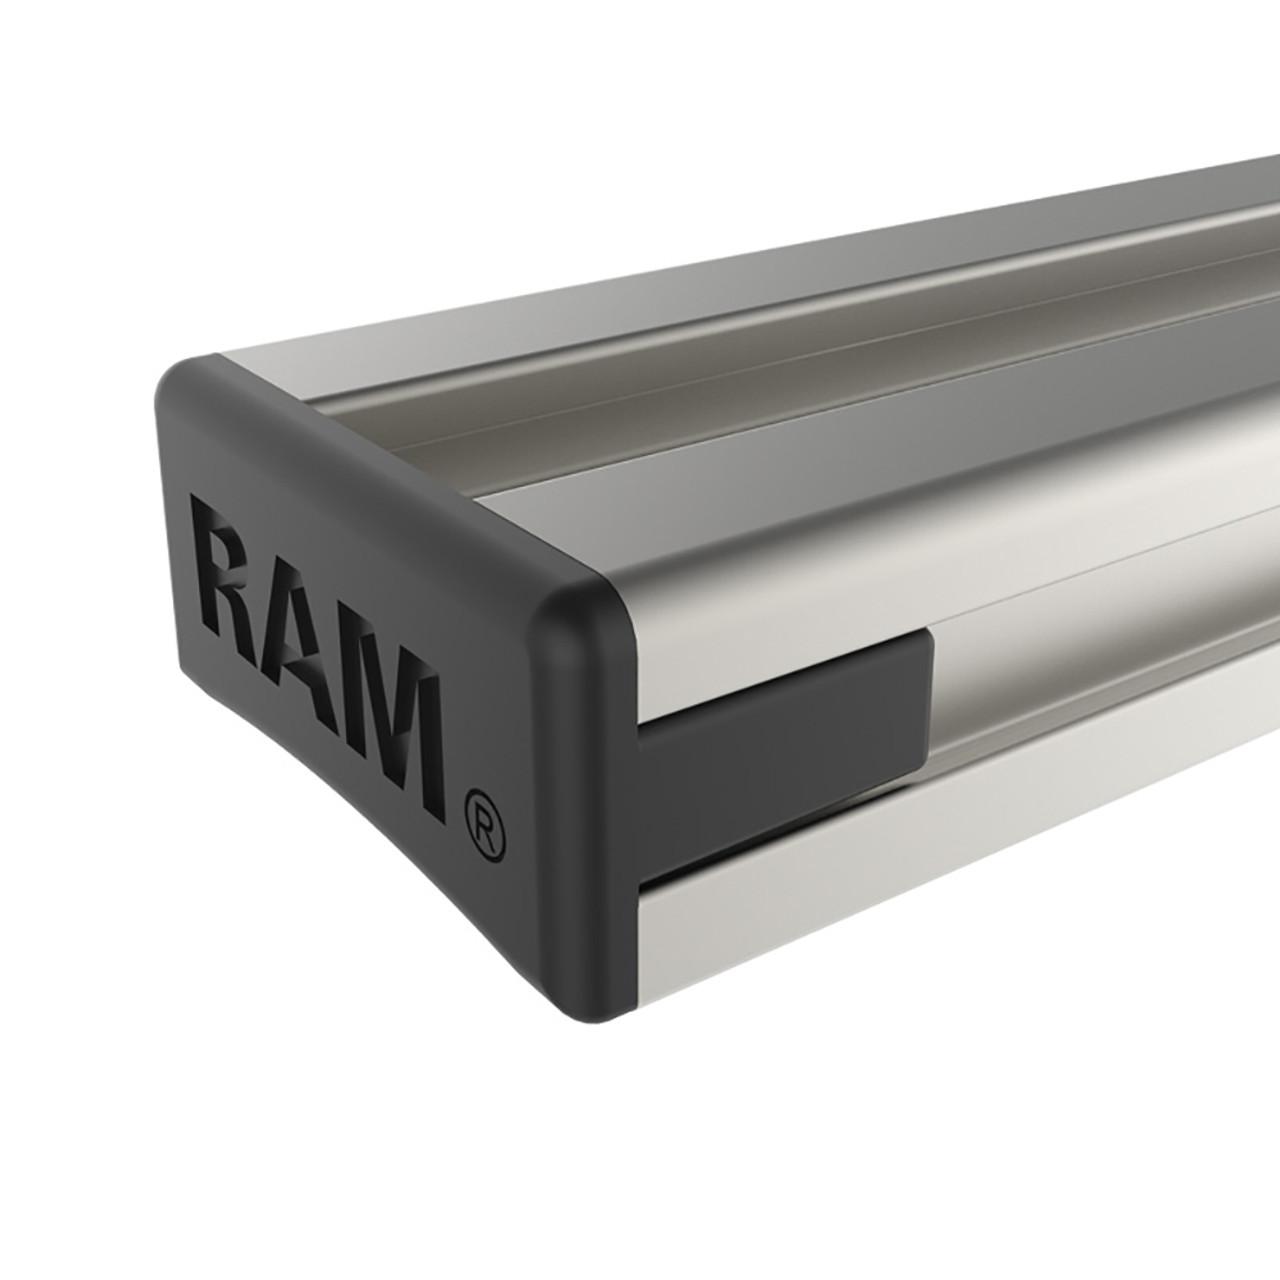 "Ram Mount 9"" Extruded Aluminum Tough-Track [RAM-TRACK-EXA-9]"